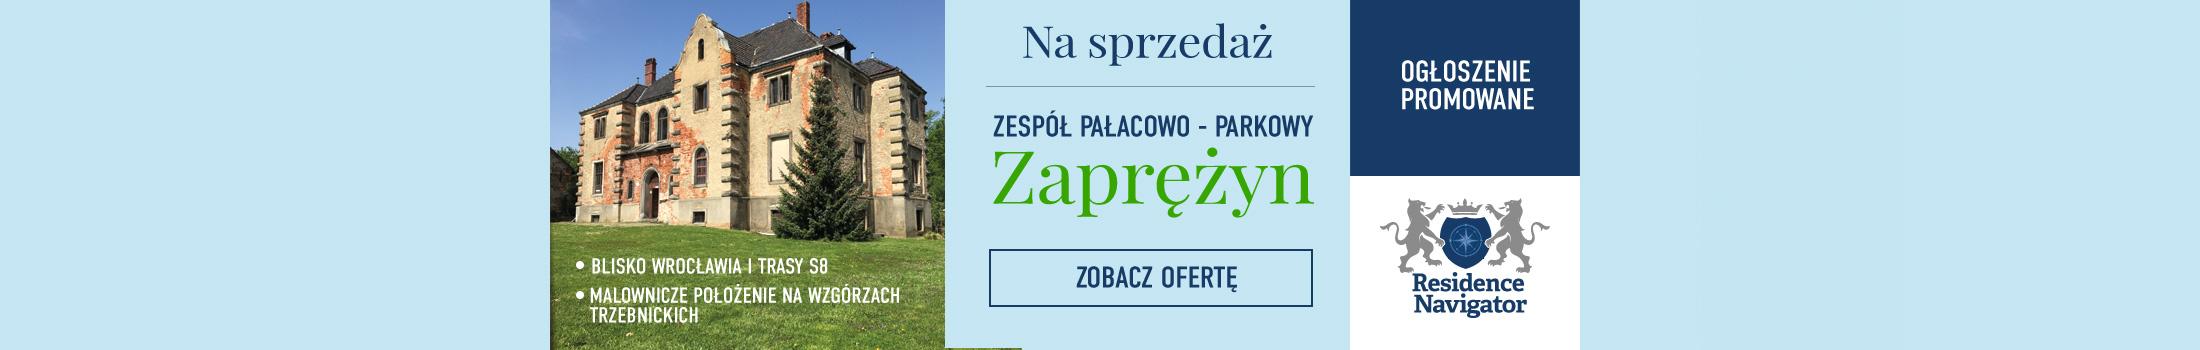 slider_navigator_zaprezyn-1